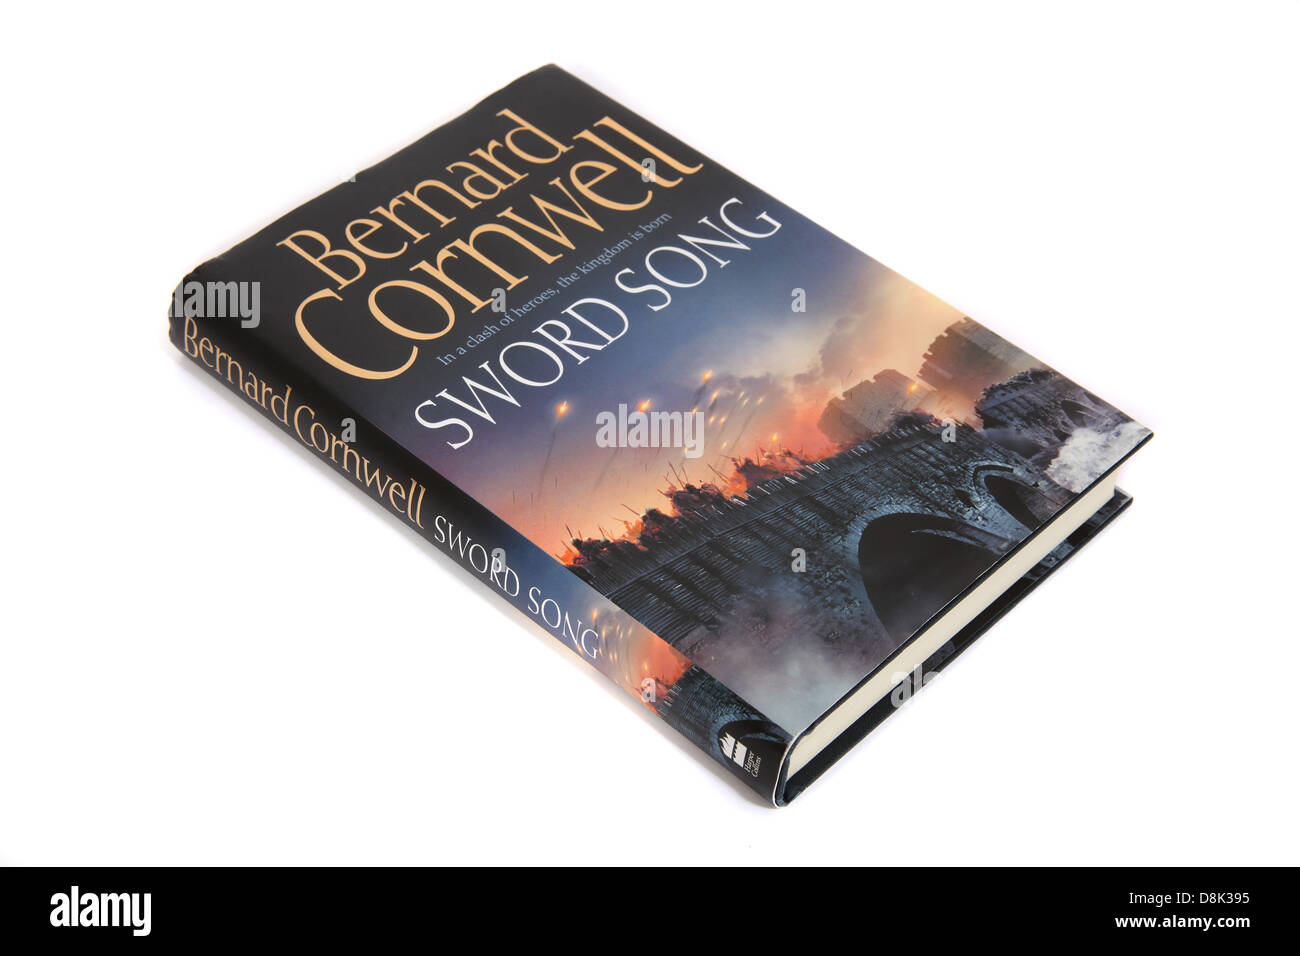 Le roman - épée chanson de Bernard Cornwell Photo Stock